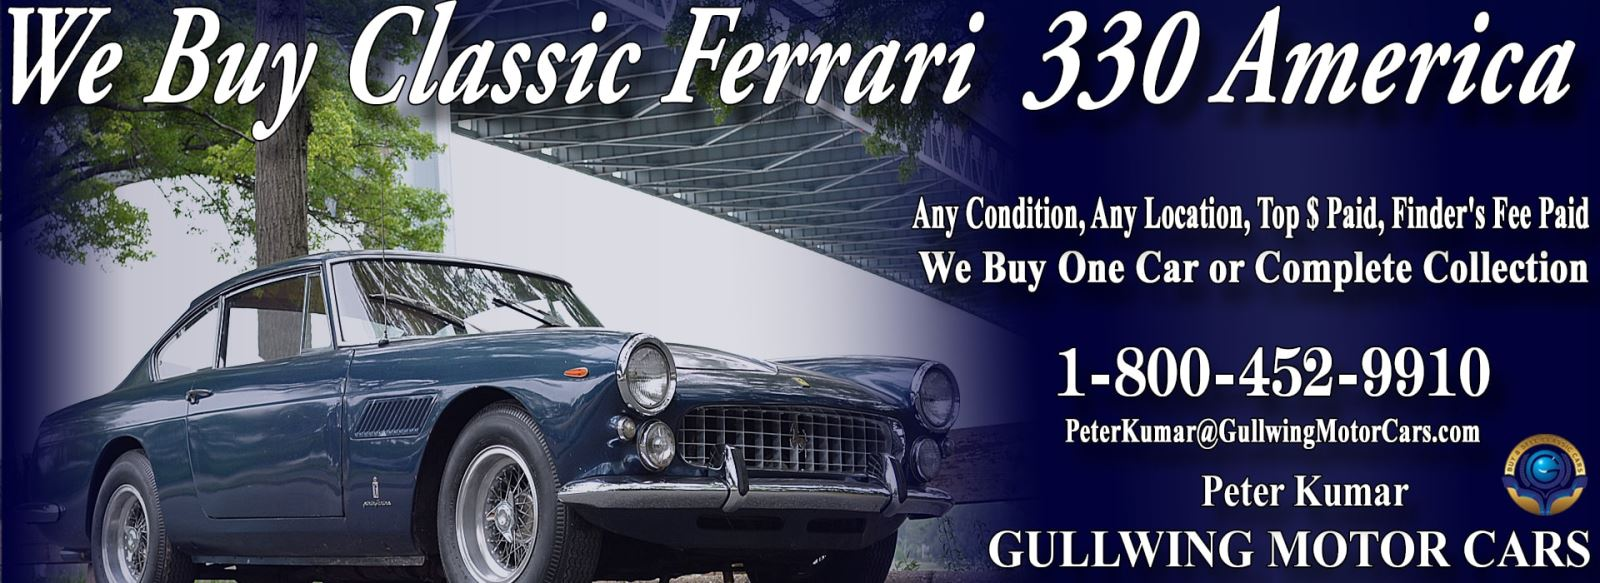 Classic Ferrari 330 America for sale, we buy vintage Ferrari 330 America. Call Peter Kumar. Gullwing Motor